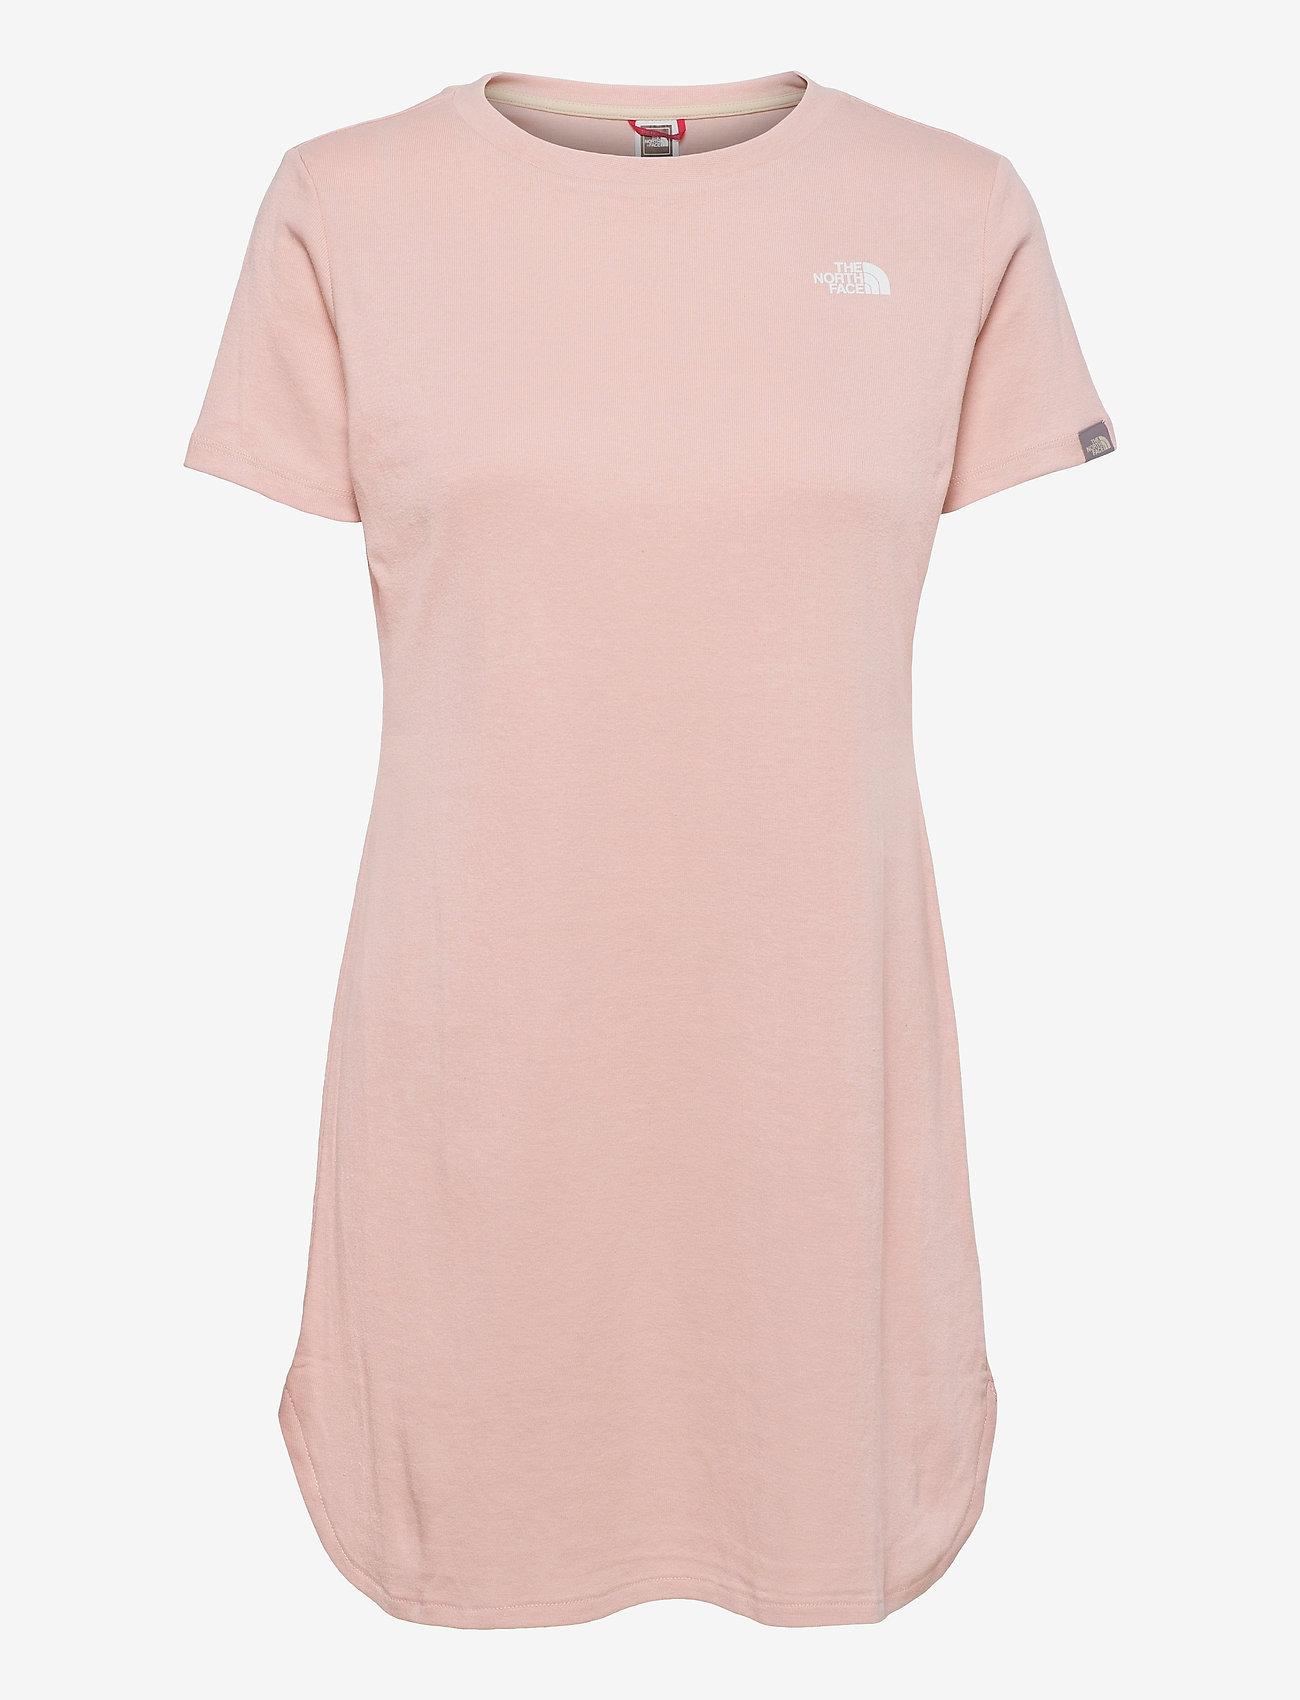 The North Face - W SIMPLE DM DRESS - t-shirtkjoler - evening sand pink - 0